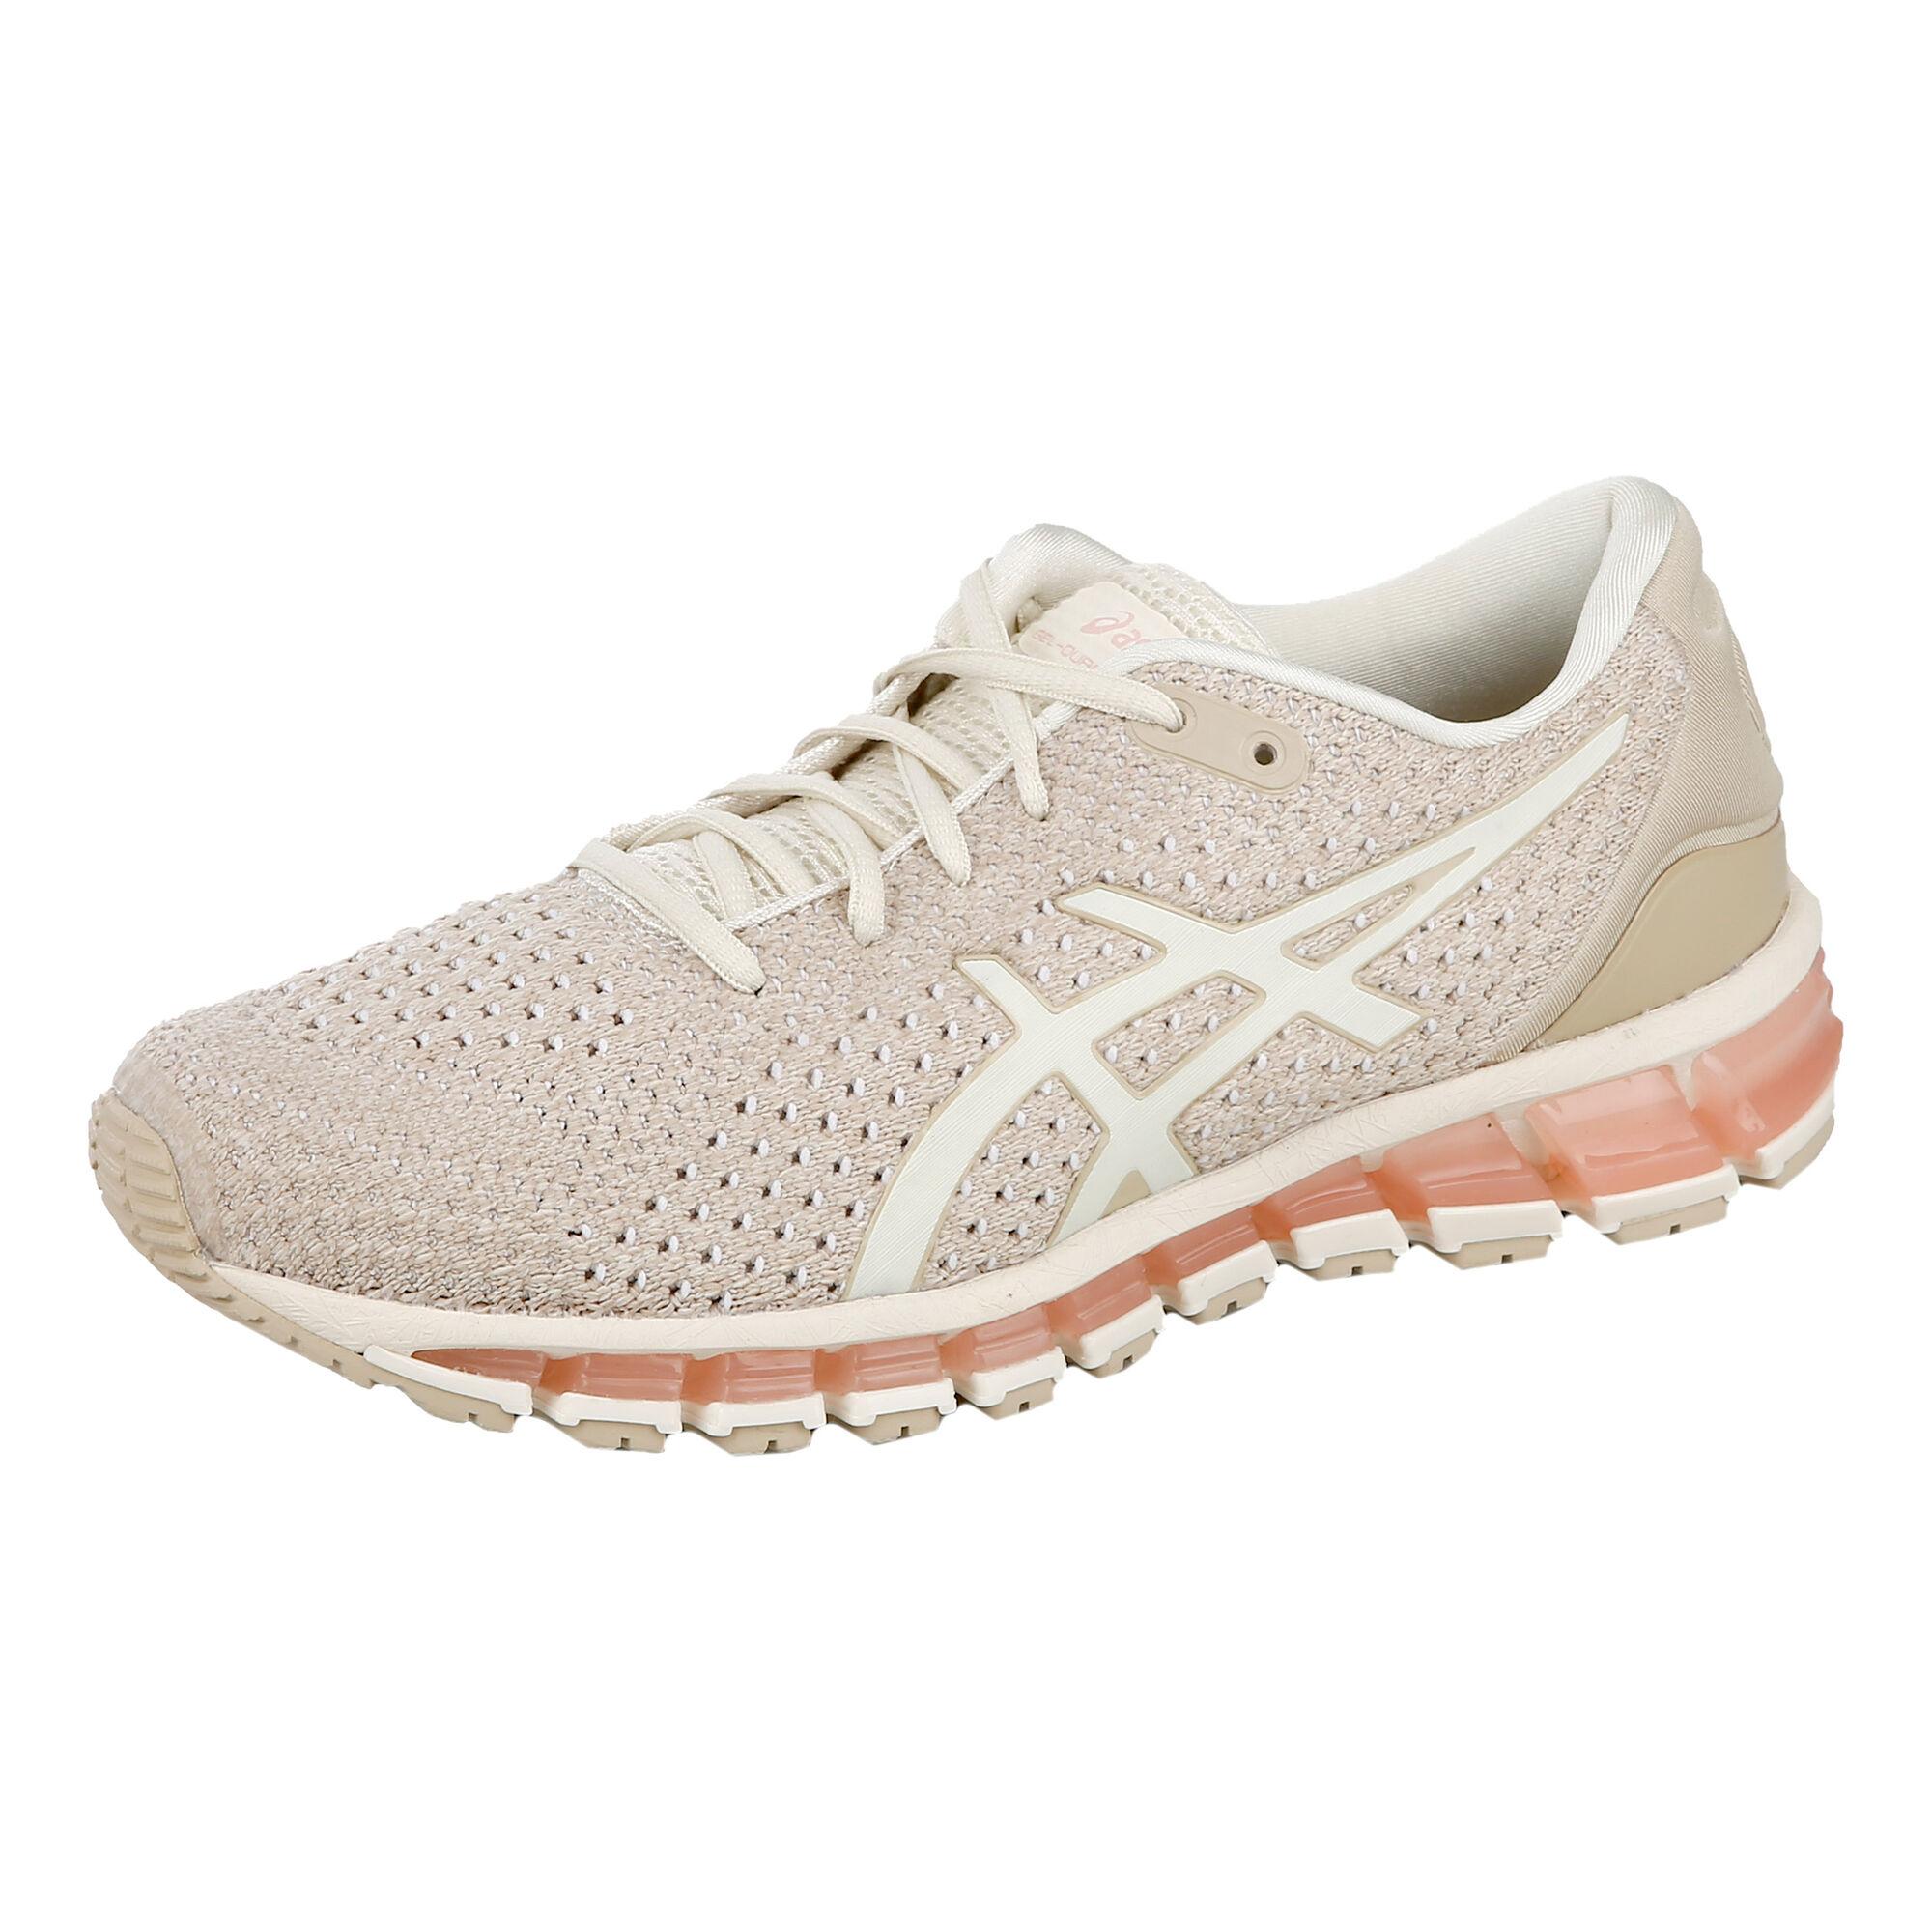 online retailer 78ff0 3ae73 buy Asics Gel-Quantum 360 Knit 2 Neutral Running Shoe Women ...